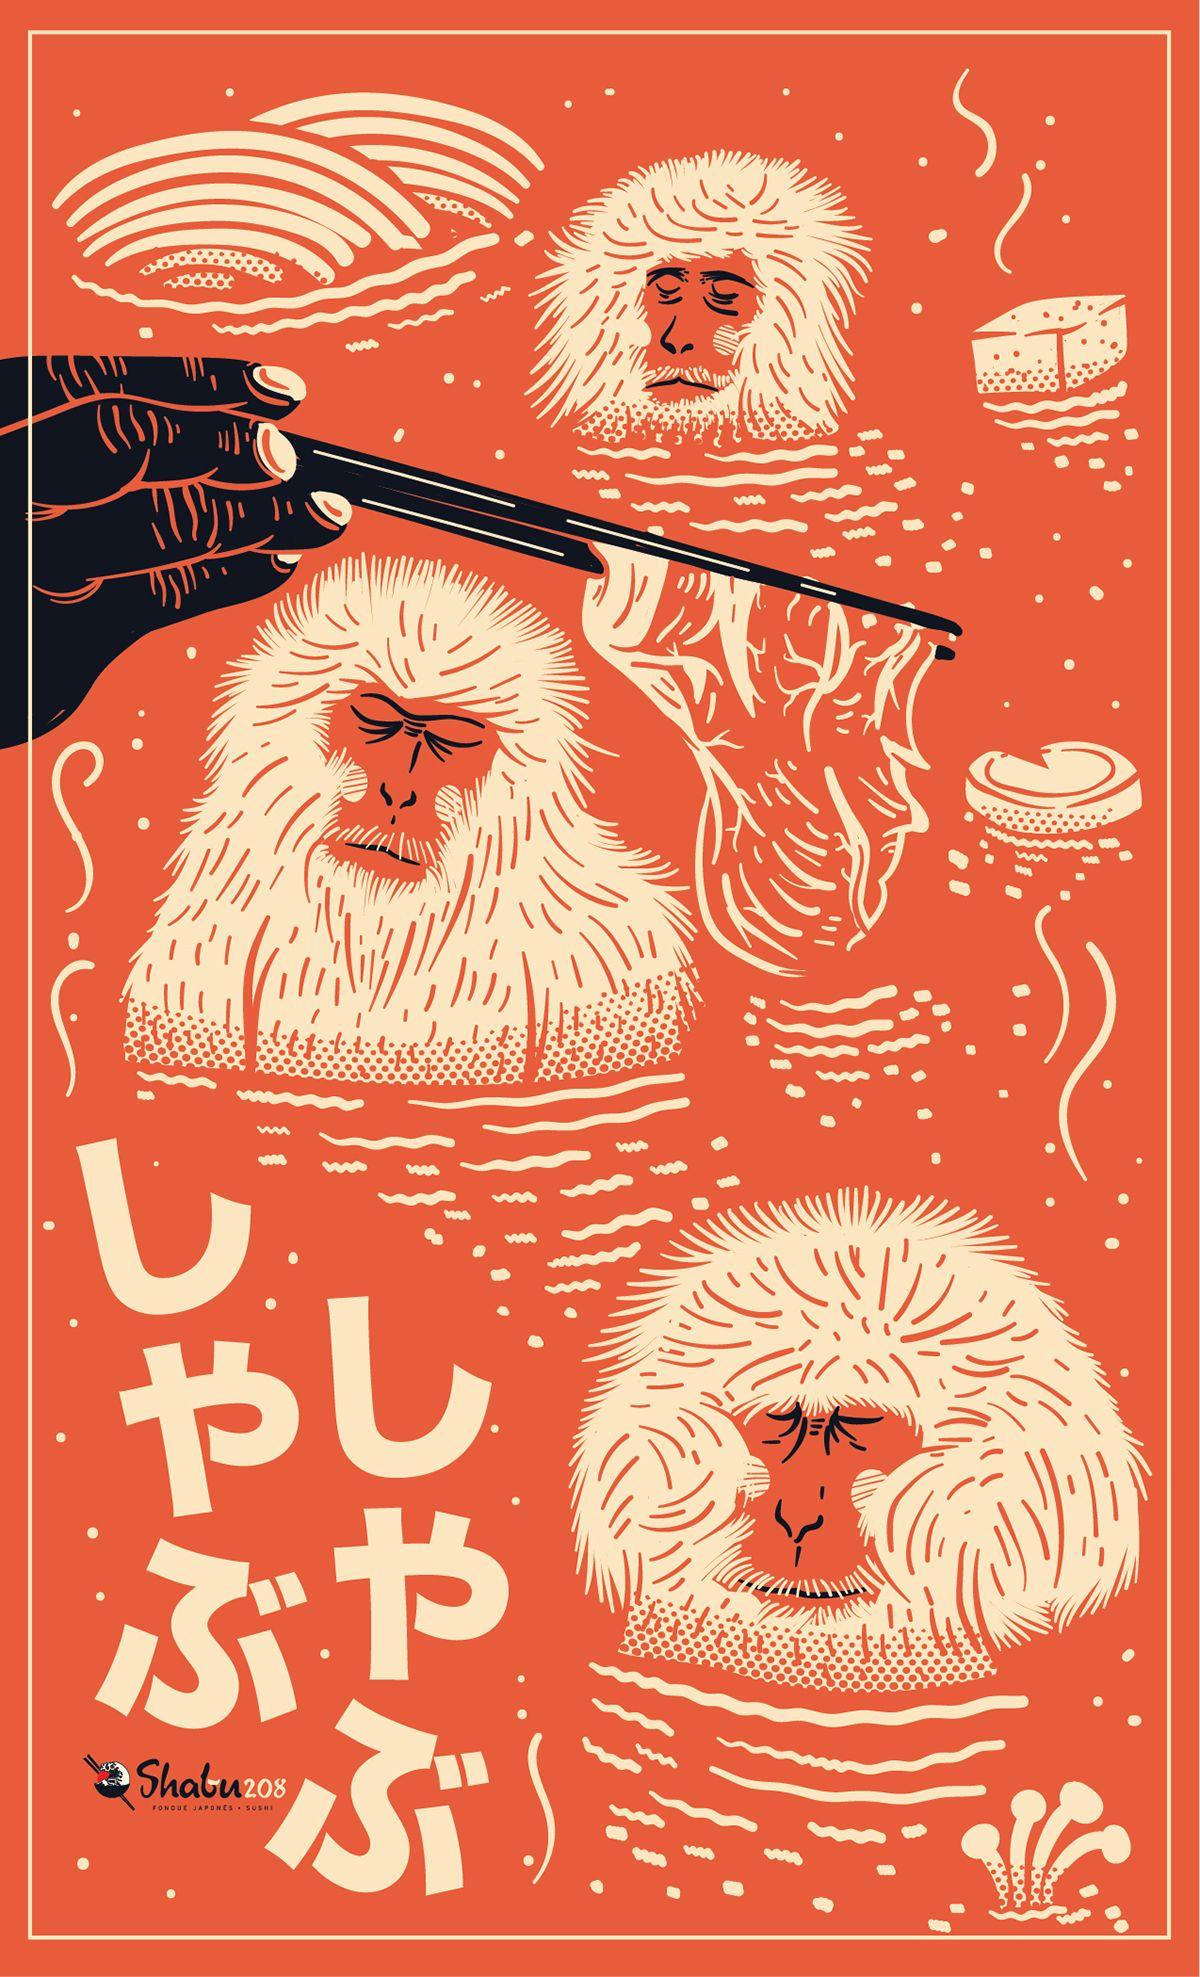 Poster for Shabu 208